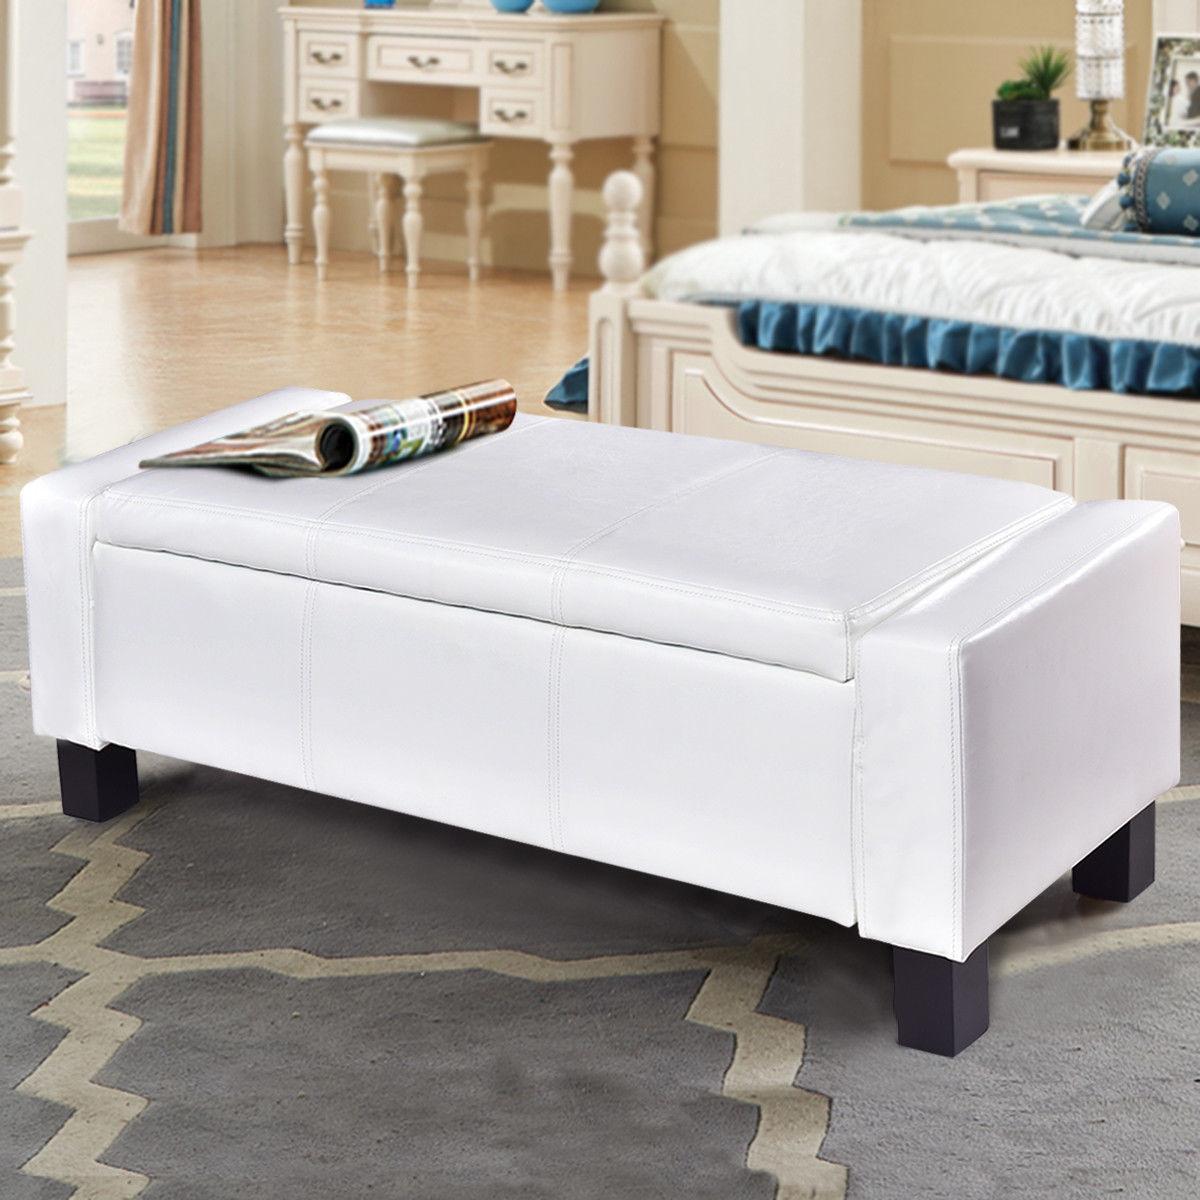 Brilliant Giantex 43 Pu Leather Ottoman Bed Storage Bench Modern Inzonedesignstudio Interior Chair Design Inzonedesignstudiocom